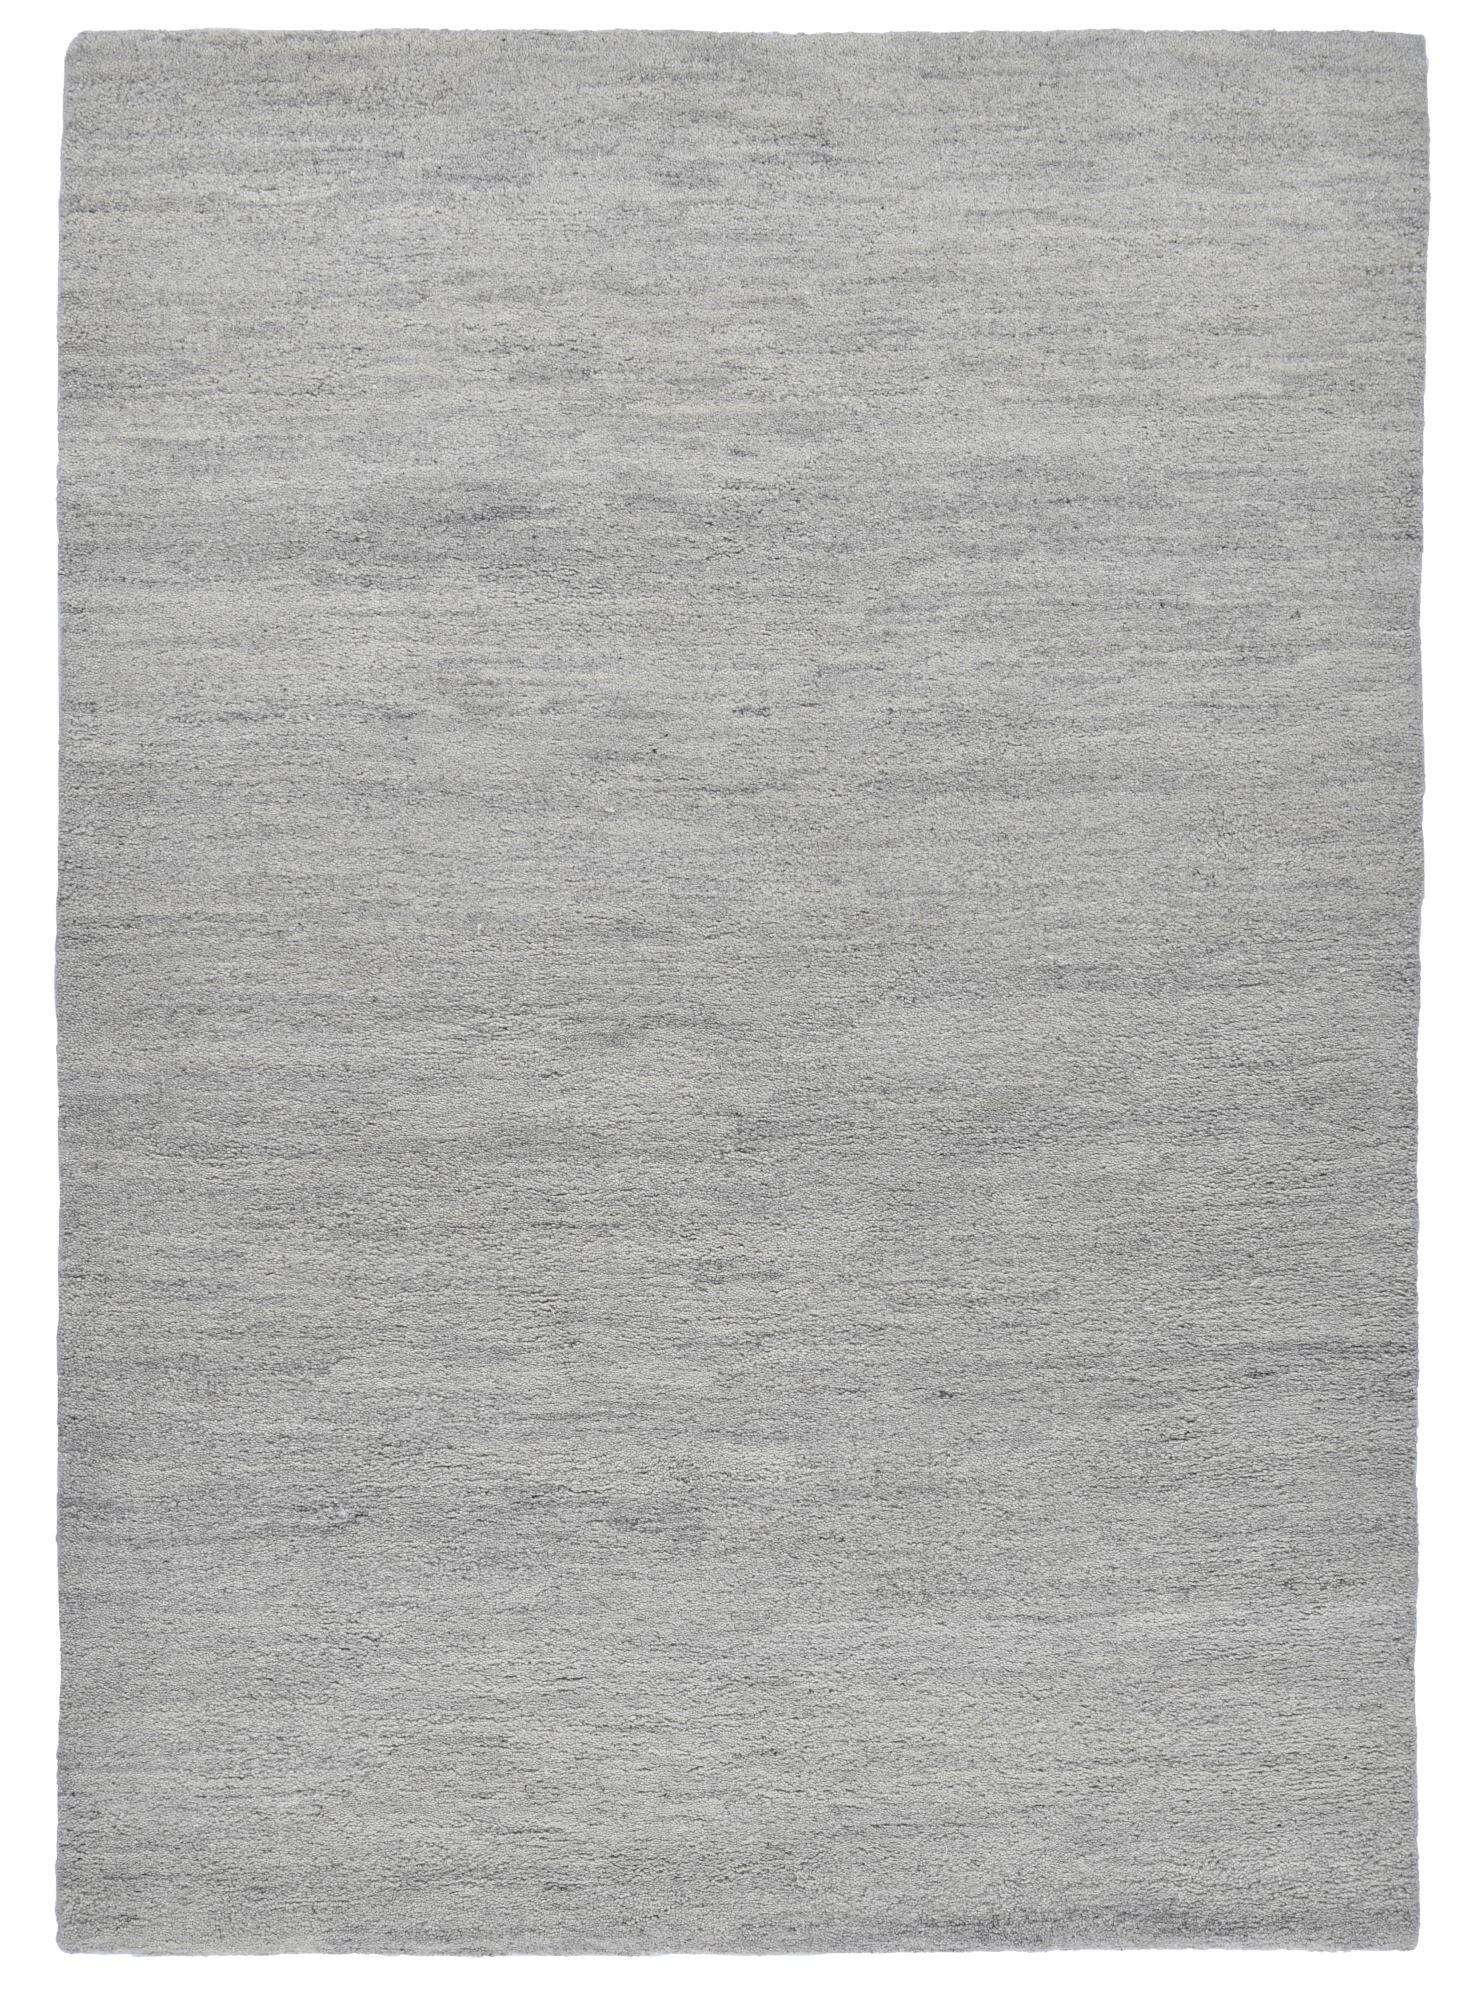 THEKO Tapis berber du maroc en laine naturelle gris 170x240